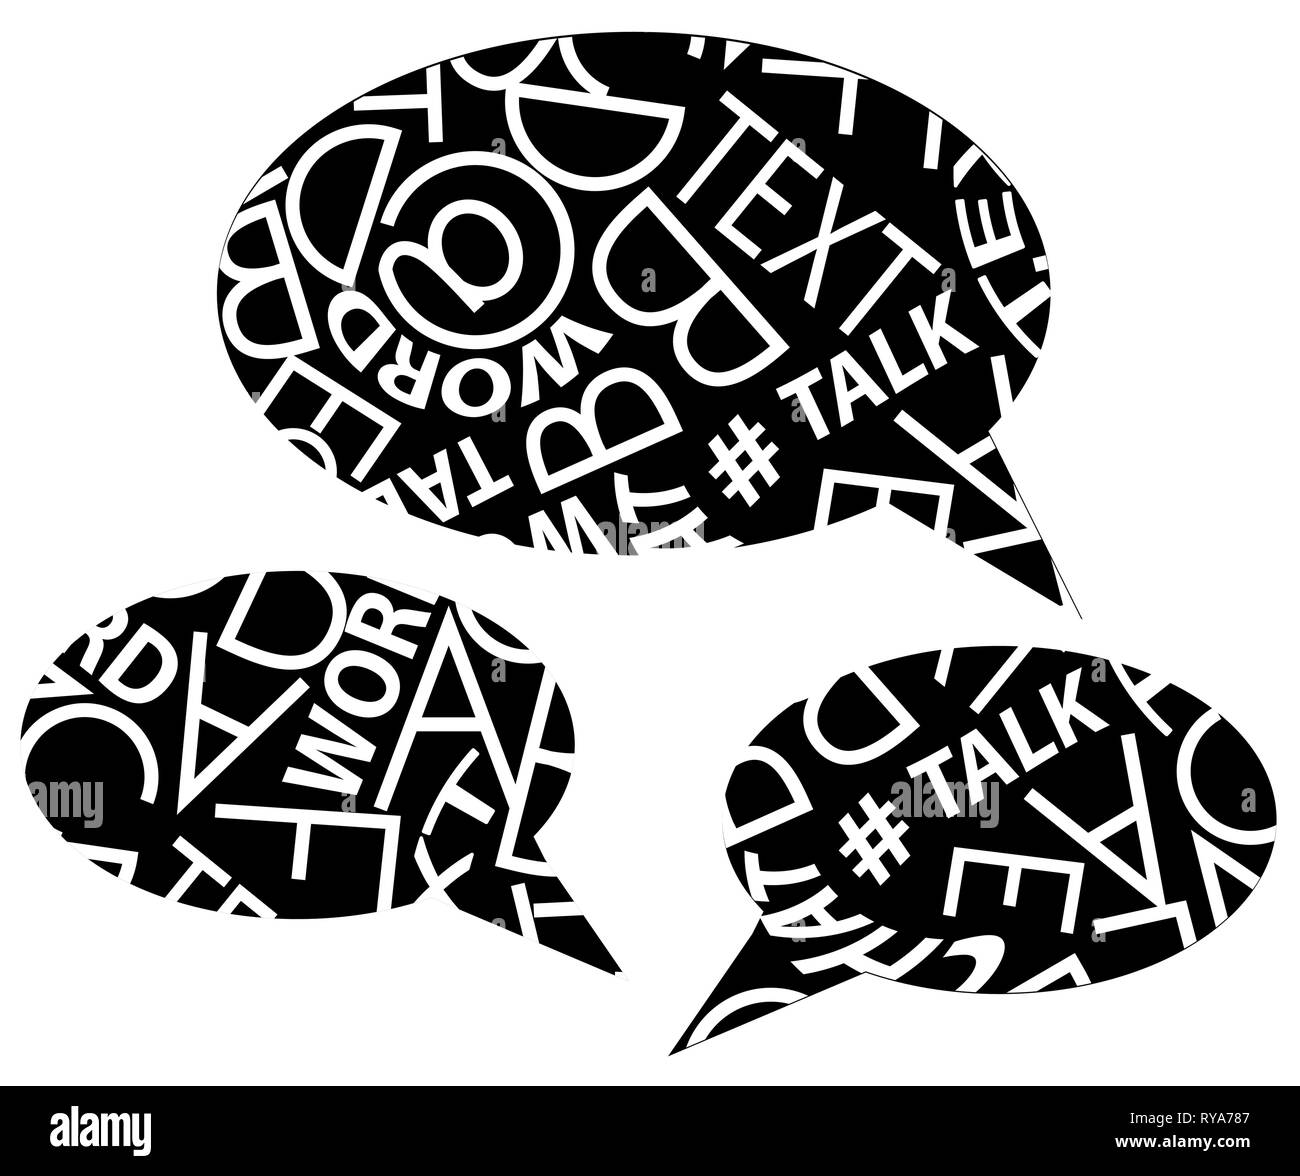 Speech bubbles full of random text pattern, vector illustration set black and white, horizontal, isolated - Stock Image